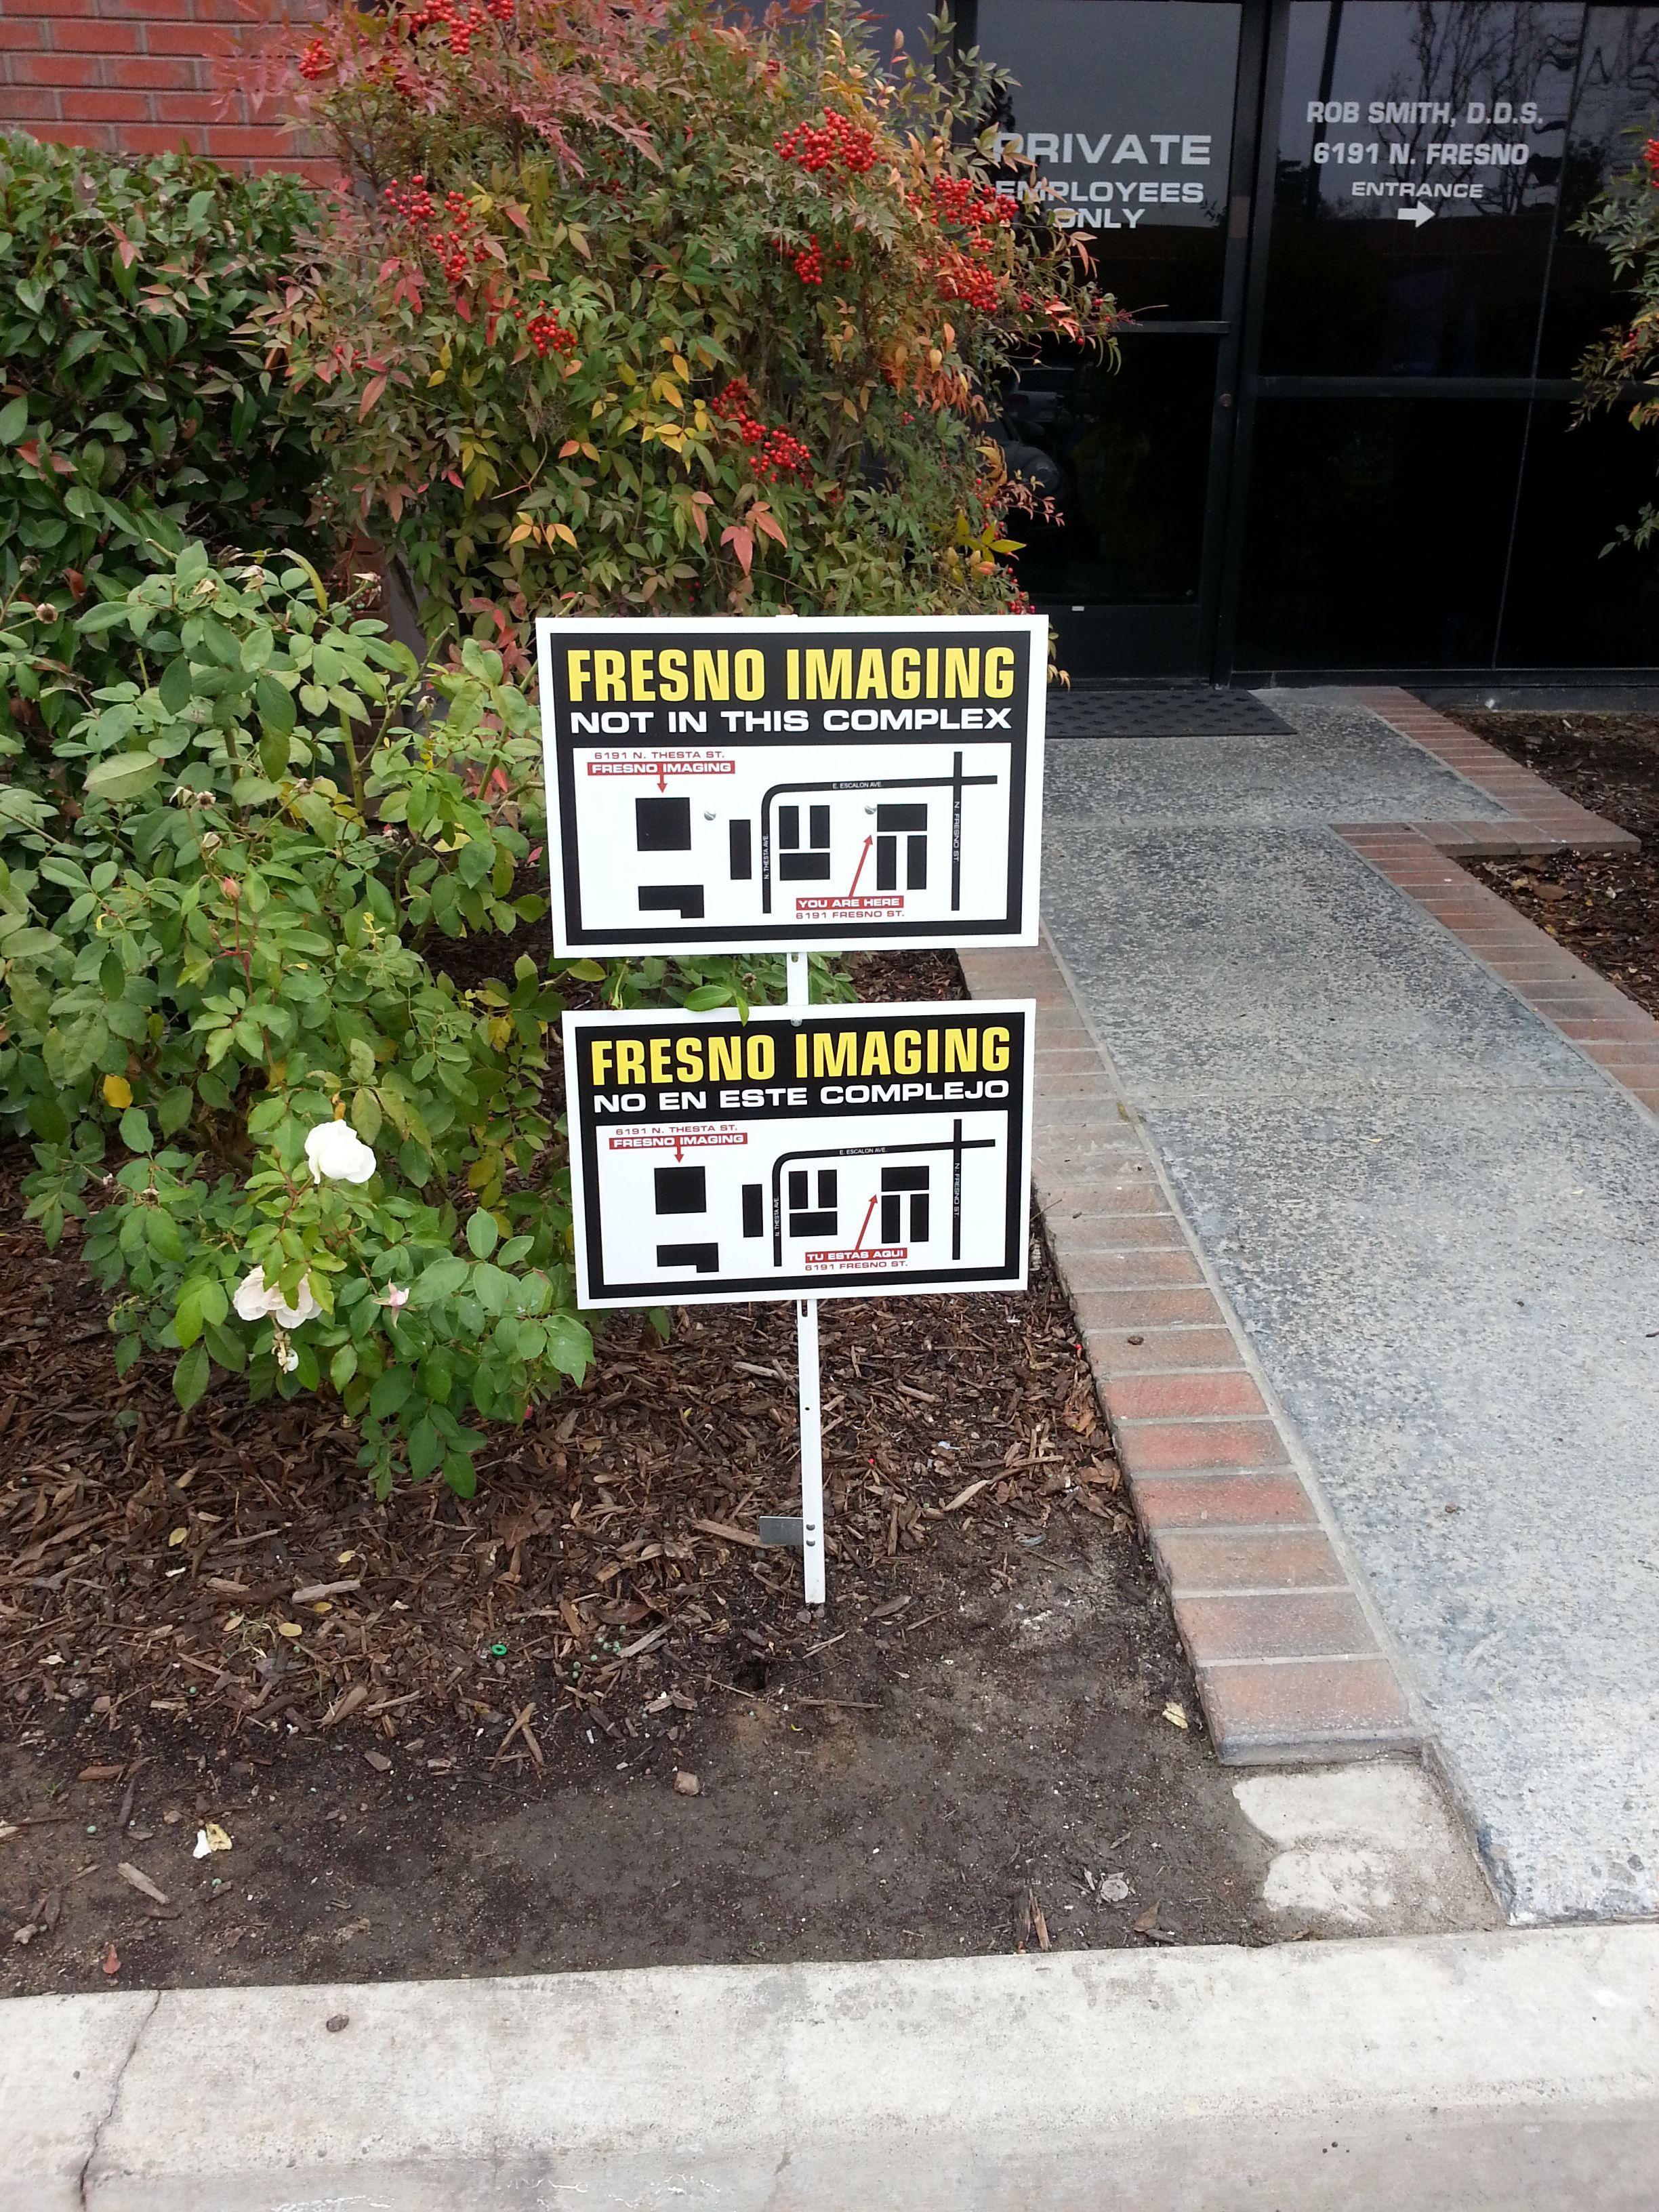 Fresno Imaging